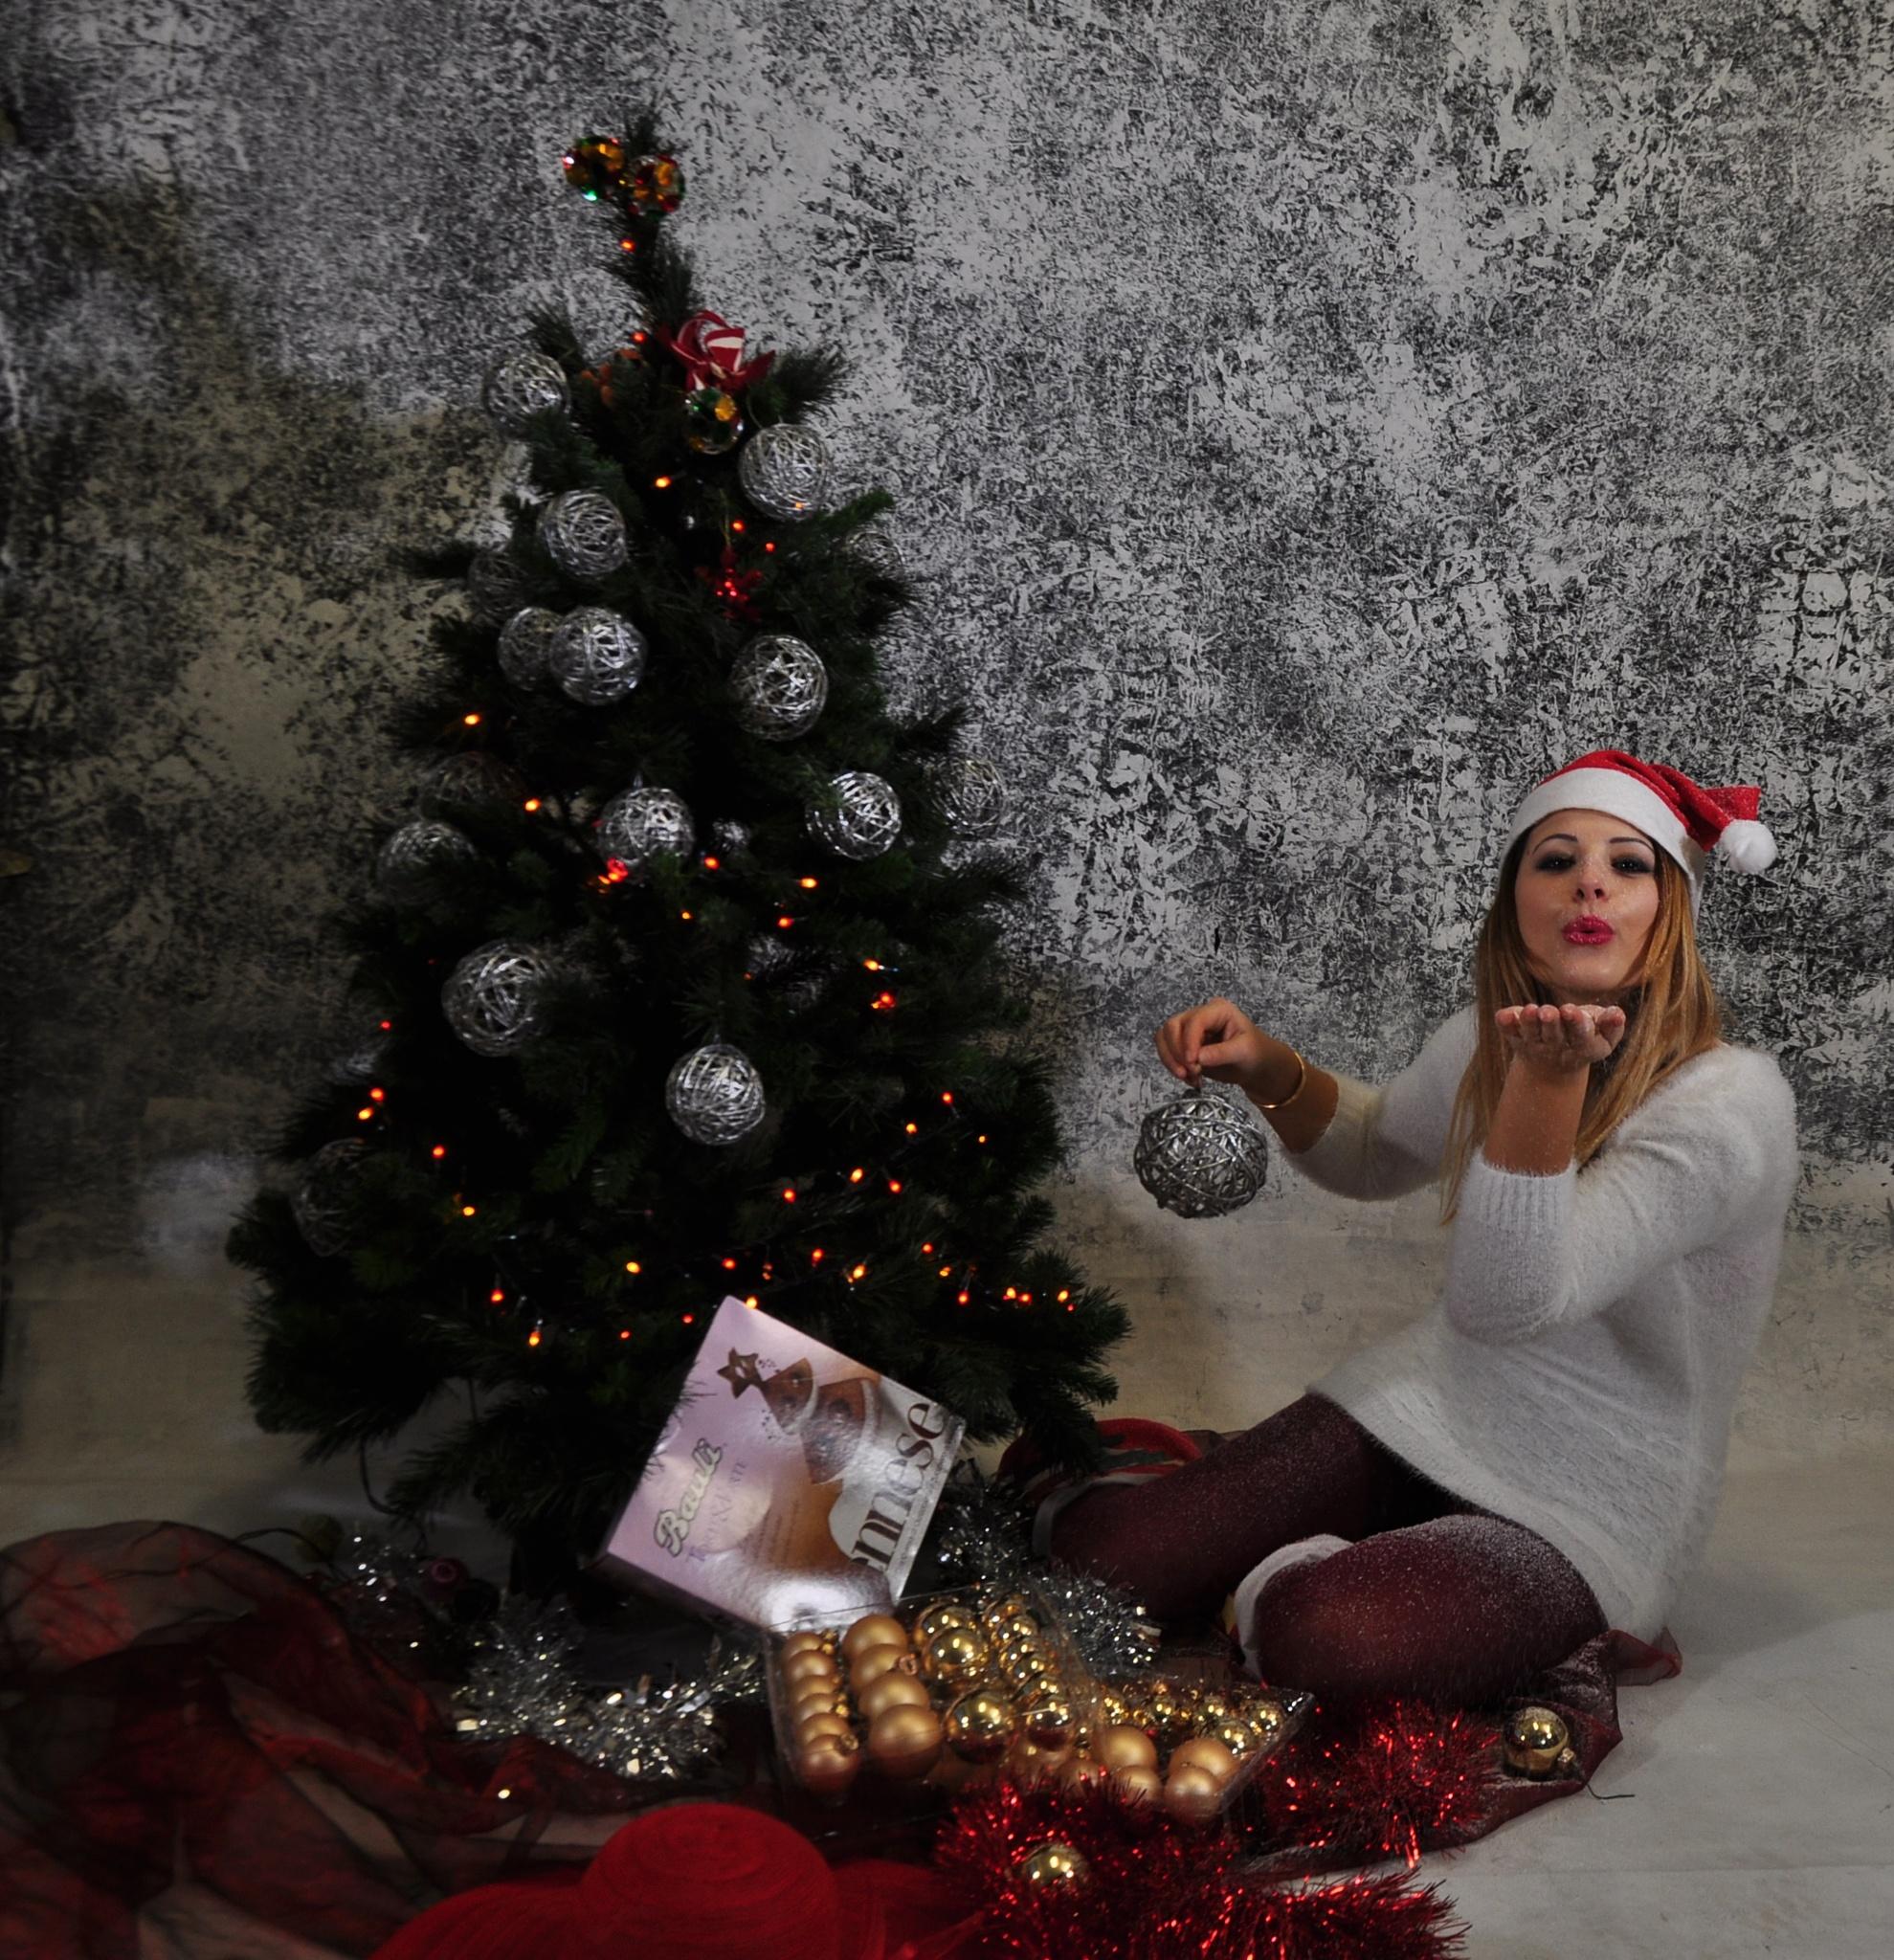 Merry Christmas by giuseppestronati